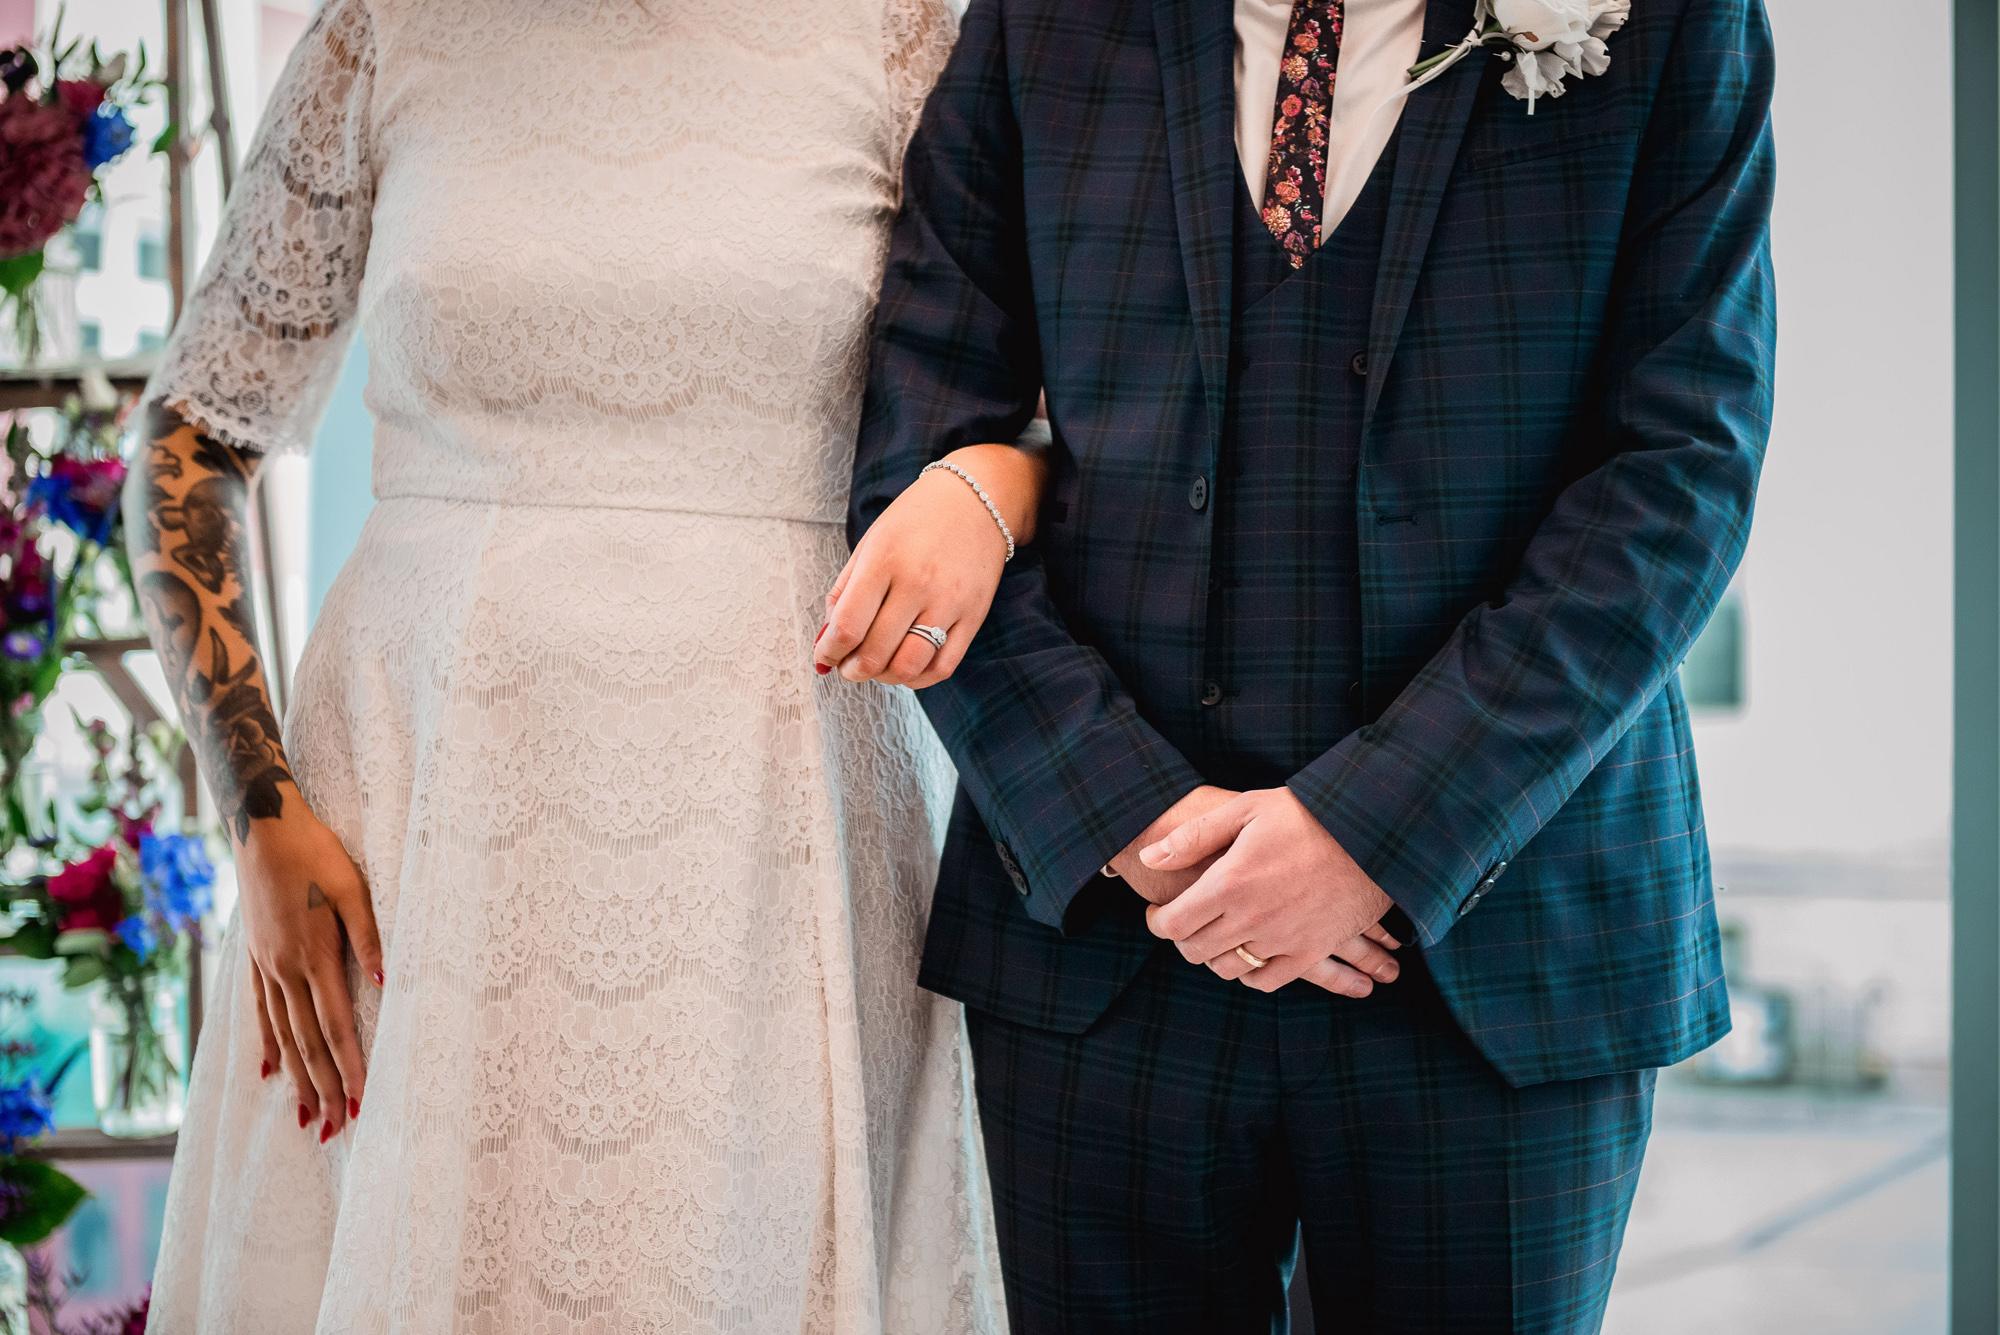 Harriet-Dahlia-Bespoke-Lace-Silk-Bohemian-Wedding-Dress-Sleeves-Tattooed-Bride-Alternative-Wedding-Sheffield-14.jpg